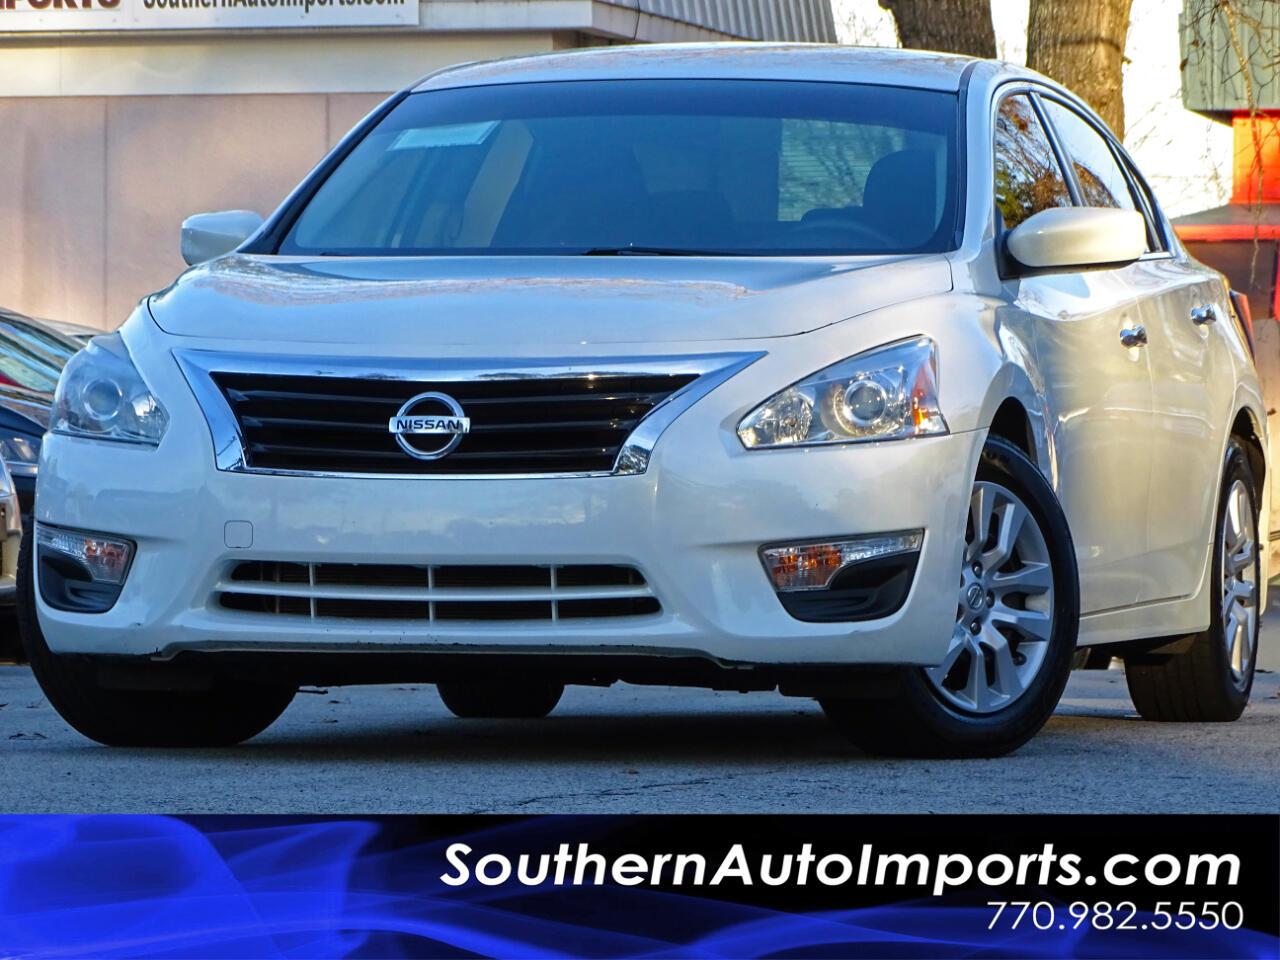 2015 Nissan Altima 2.5 S w/Low miles & Pwr seat